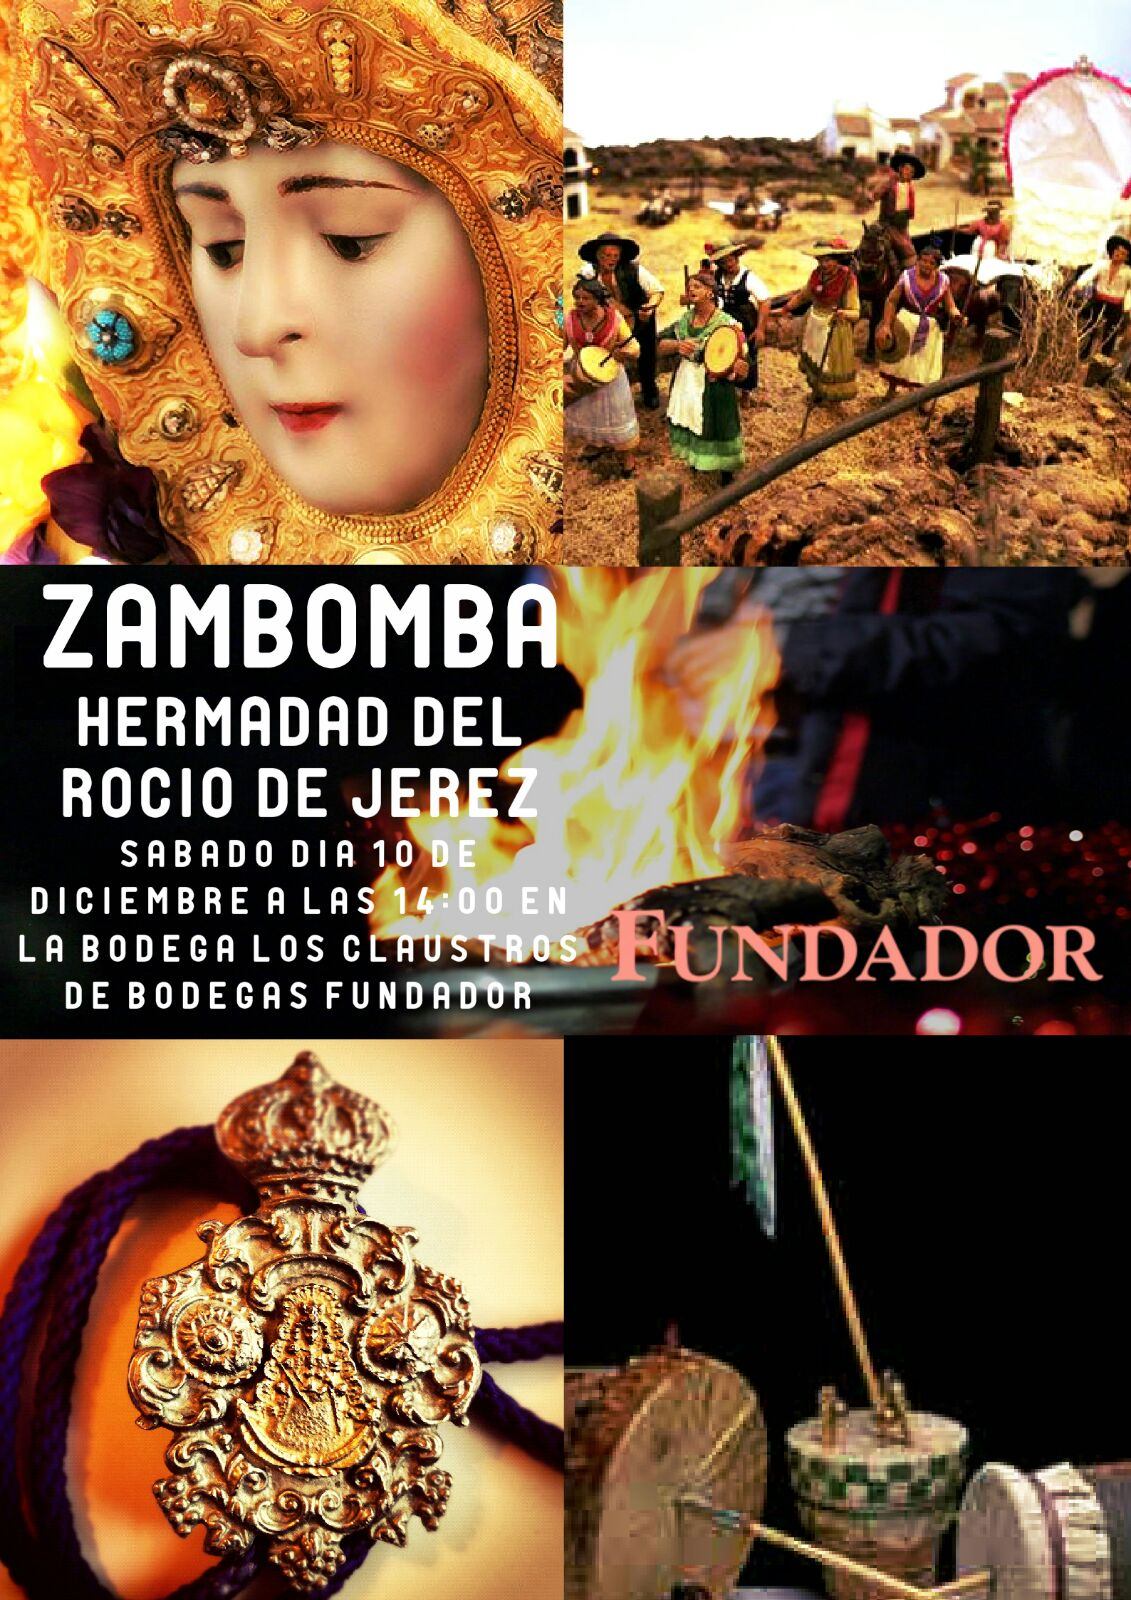 zambomba-rocio